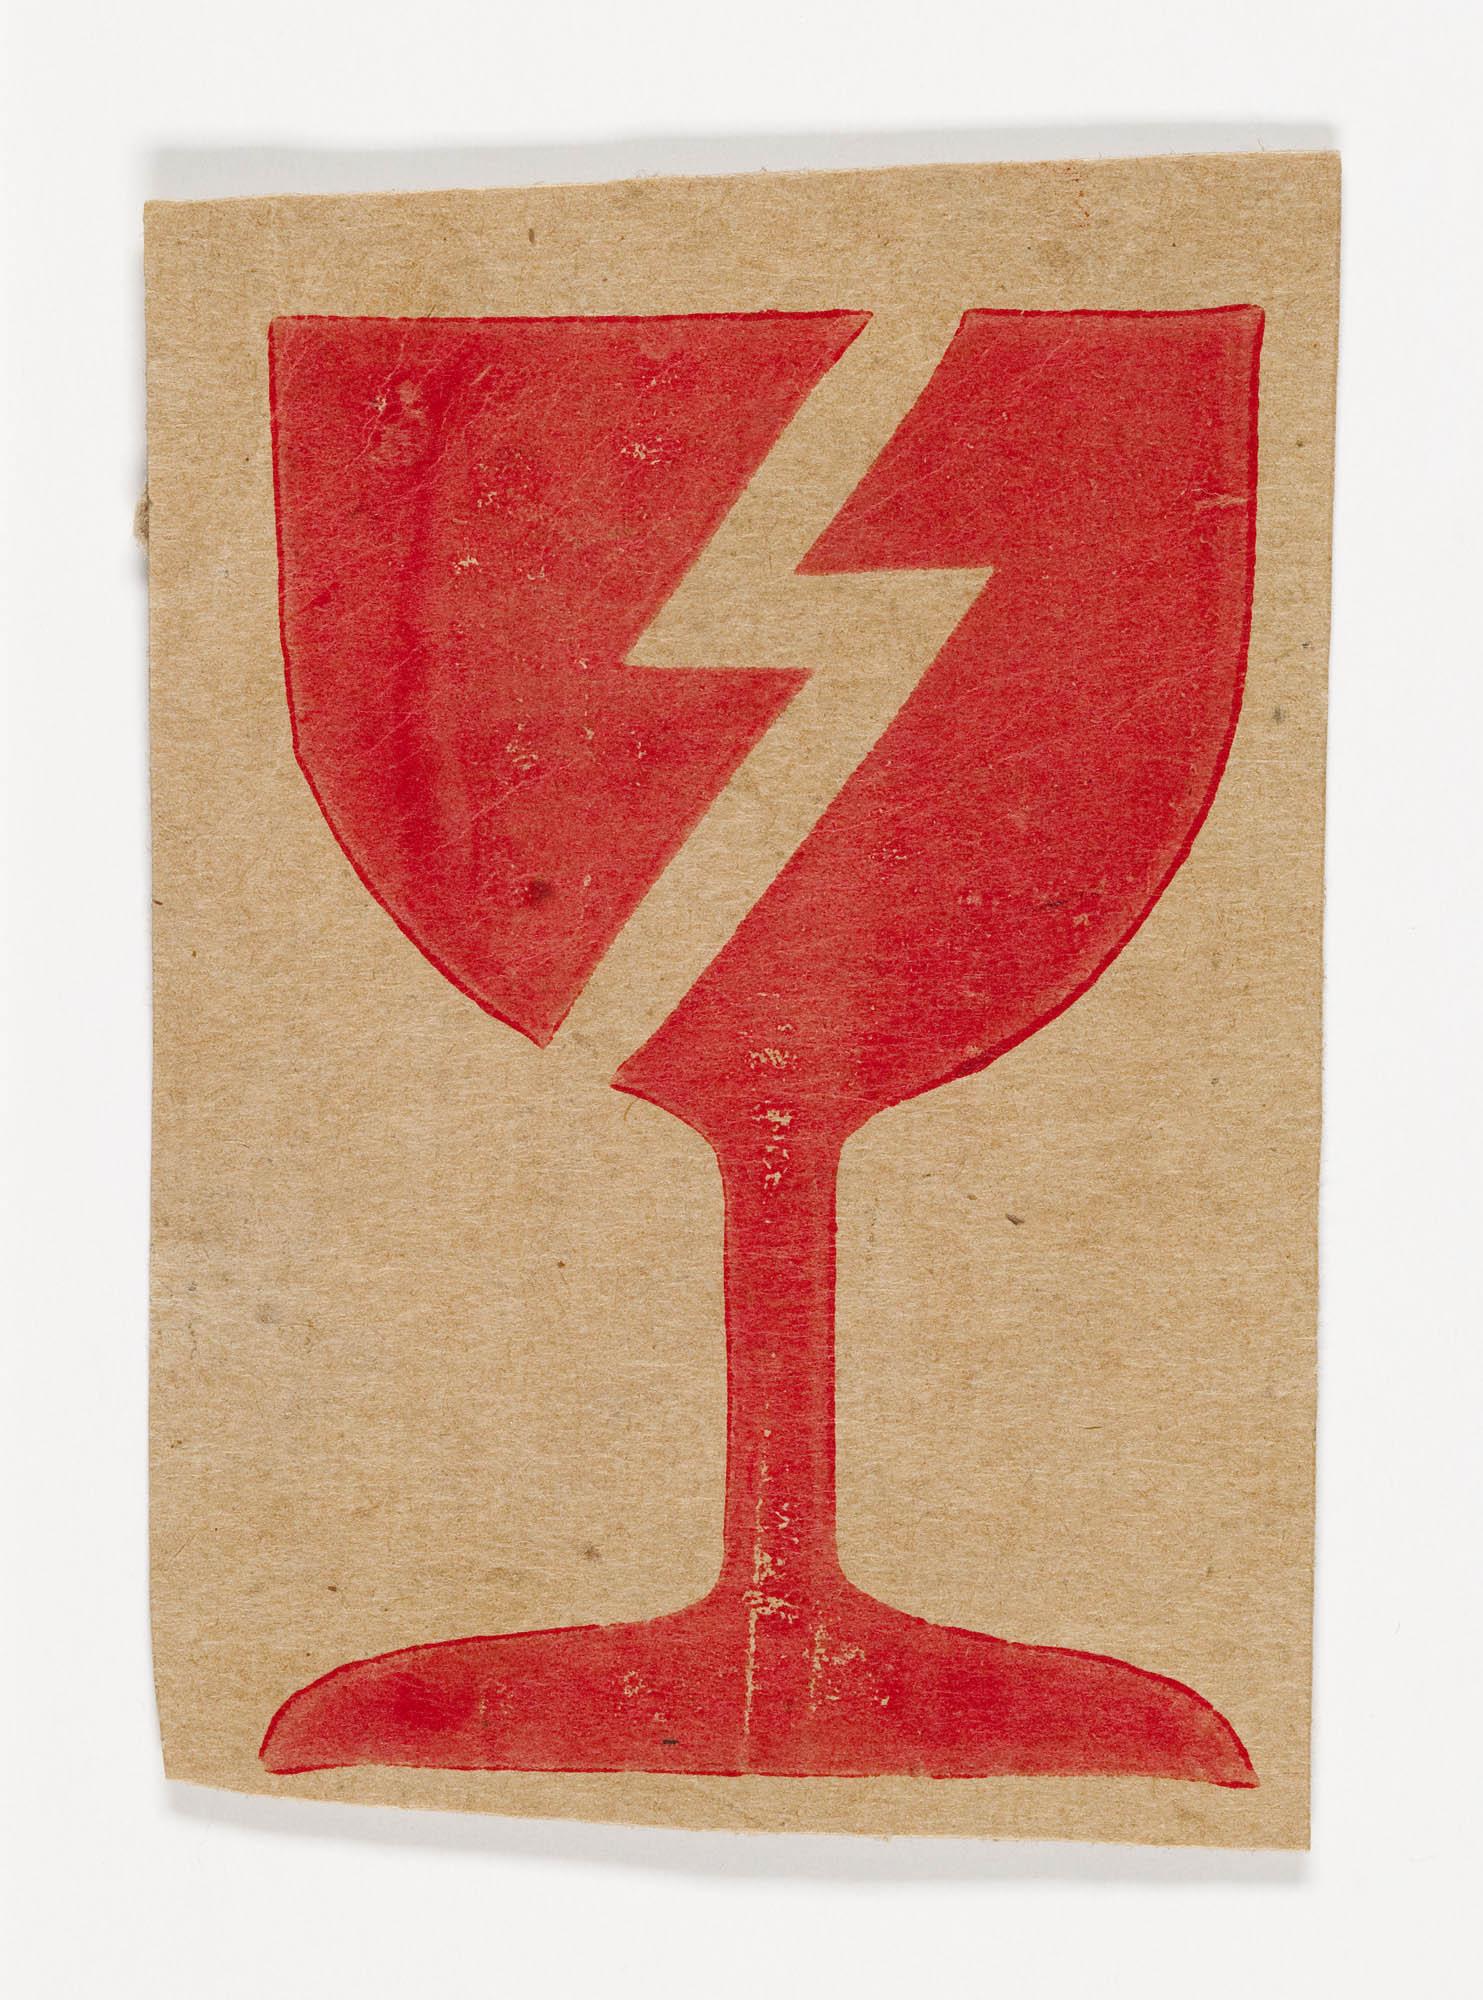 Poulet Sammlung Hans-Rudolf Lutz Pictogram